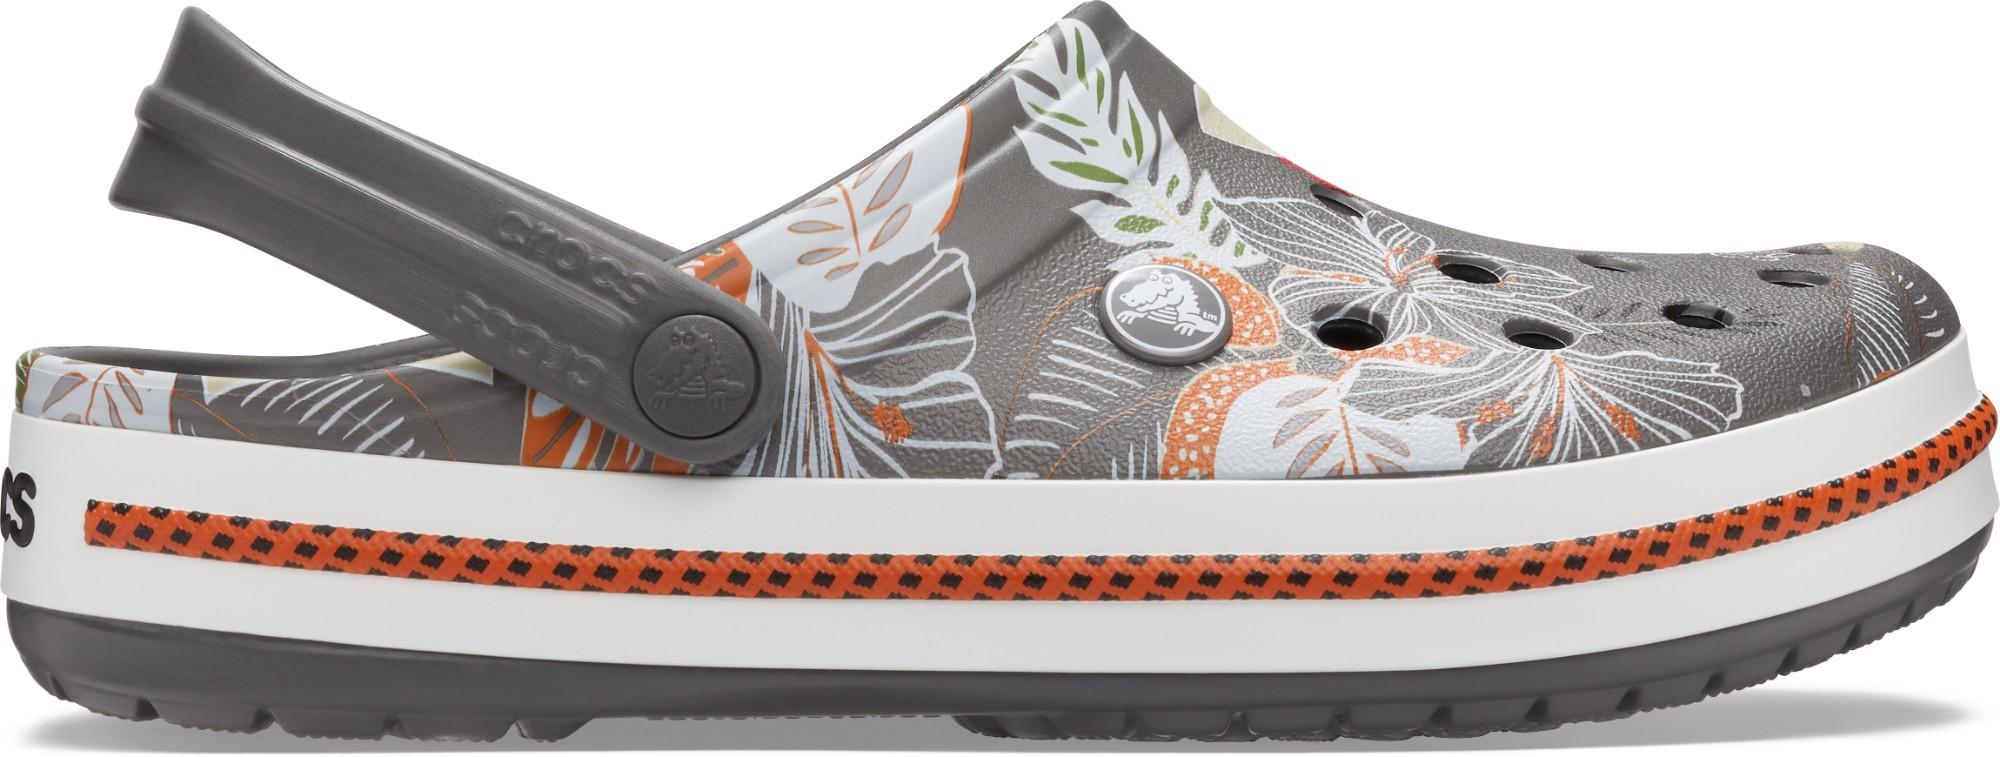 Crocs™ Crocband Botanical Print Clog Slate Grey/White 38,5